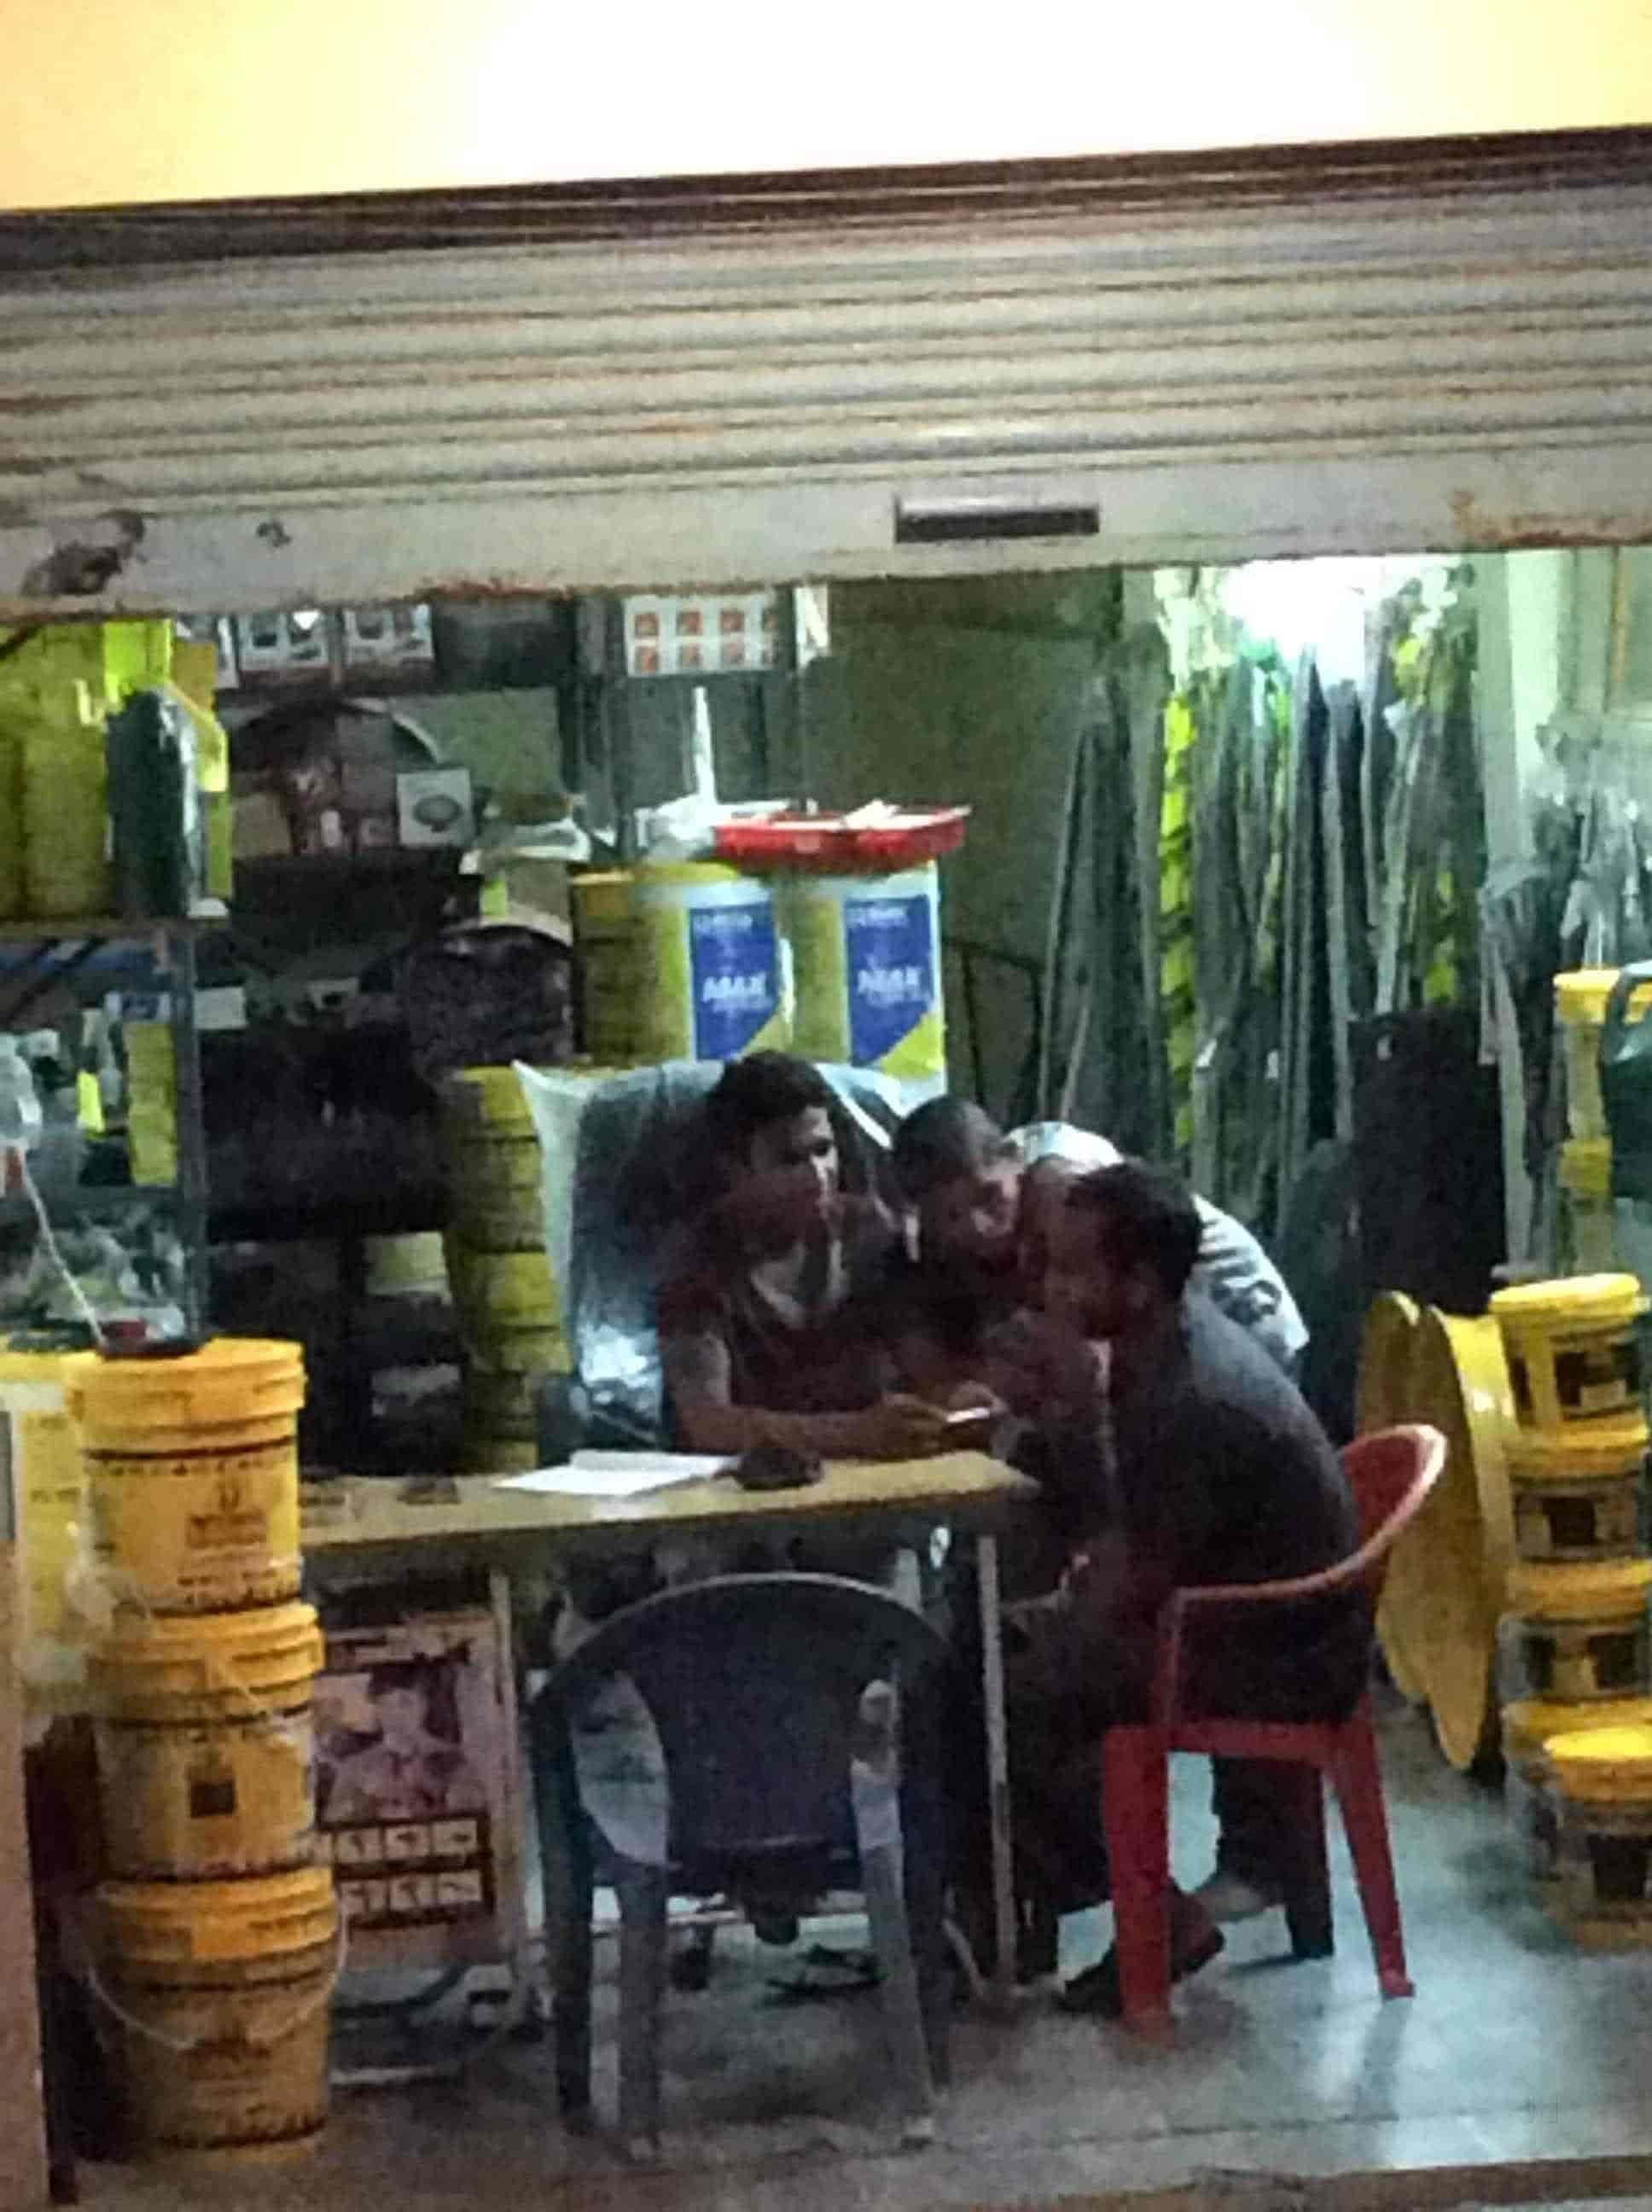 Bismillah Jcb Spare Parts Photos, Medchal, Rangareddy